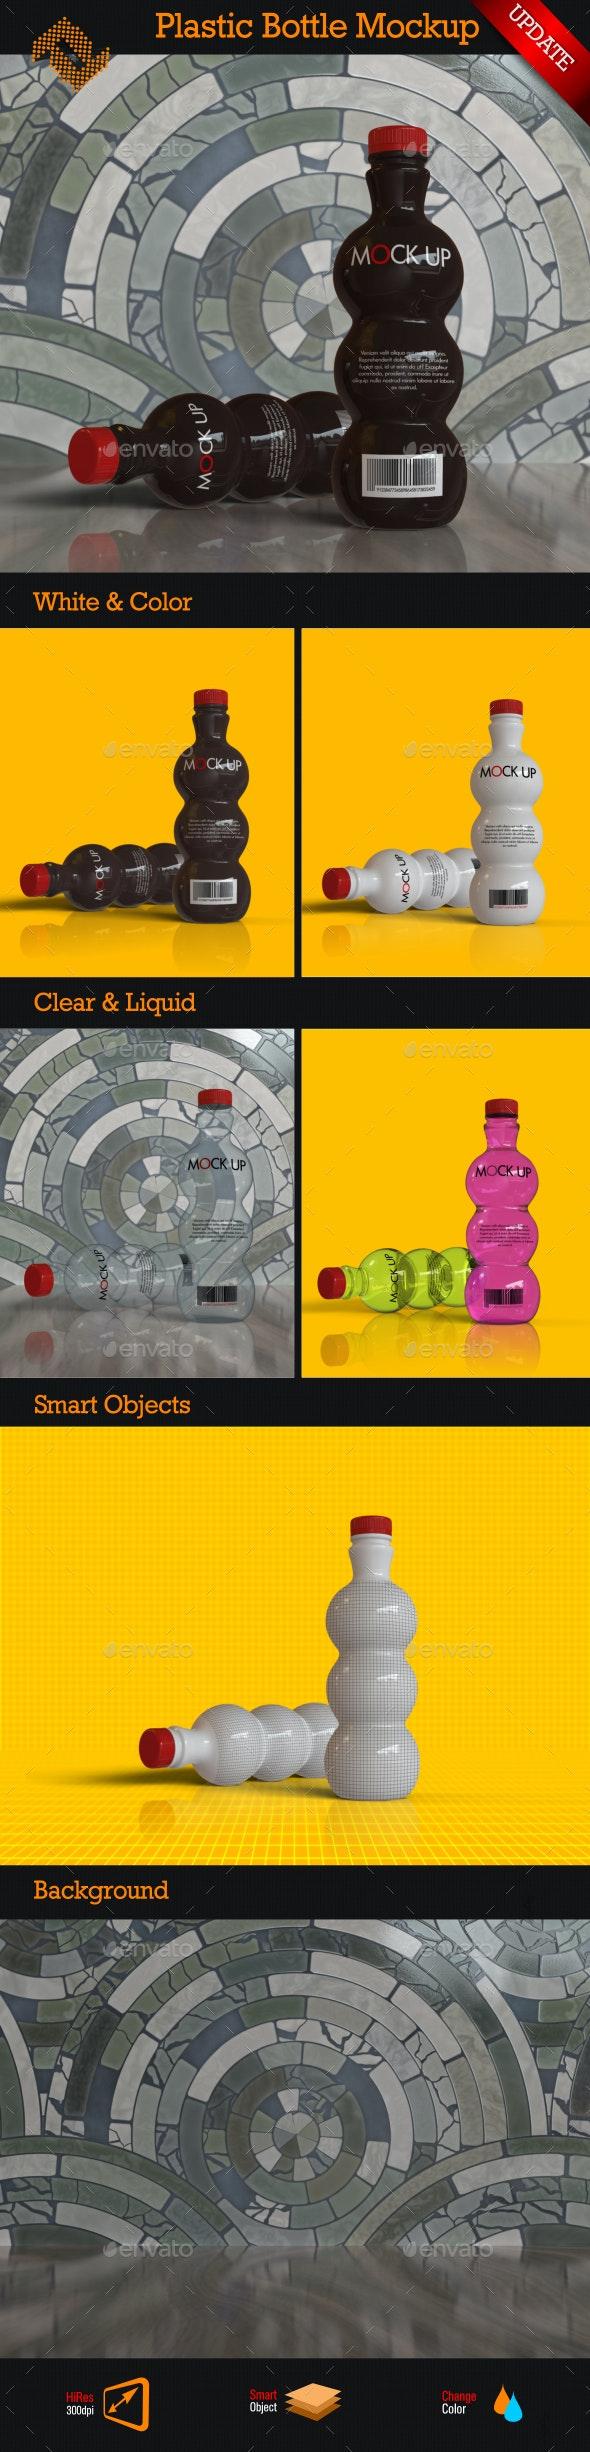 Plastic Bottle Mockup - Food and Drink Packaging